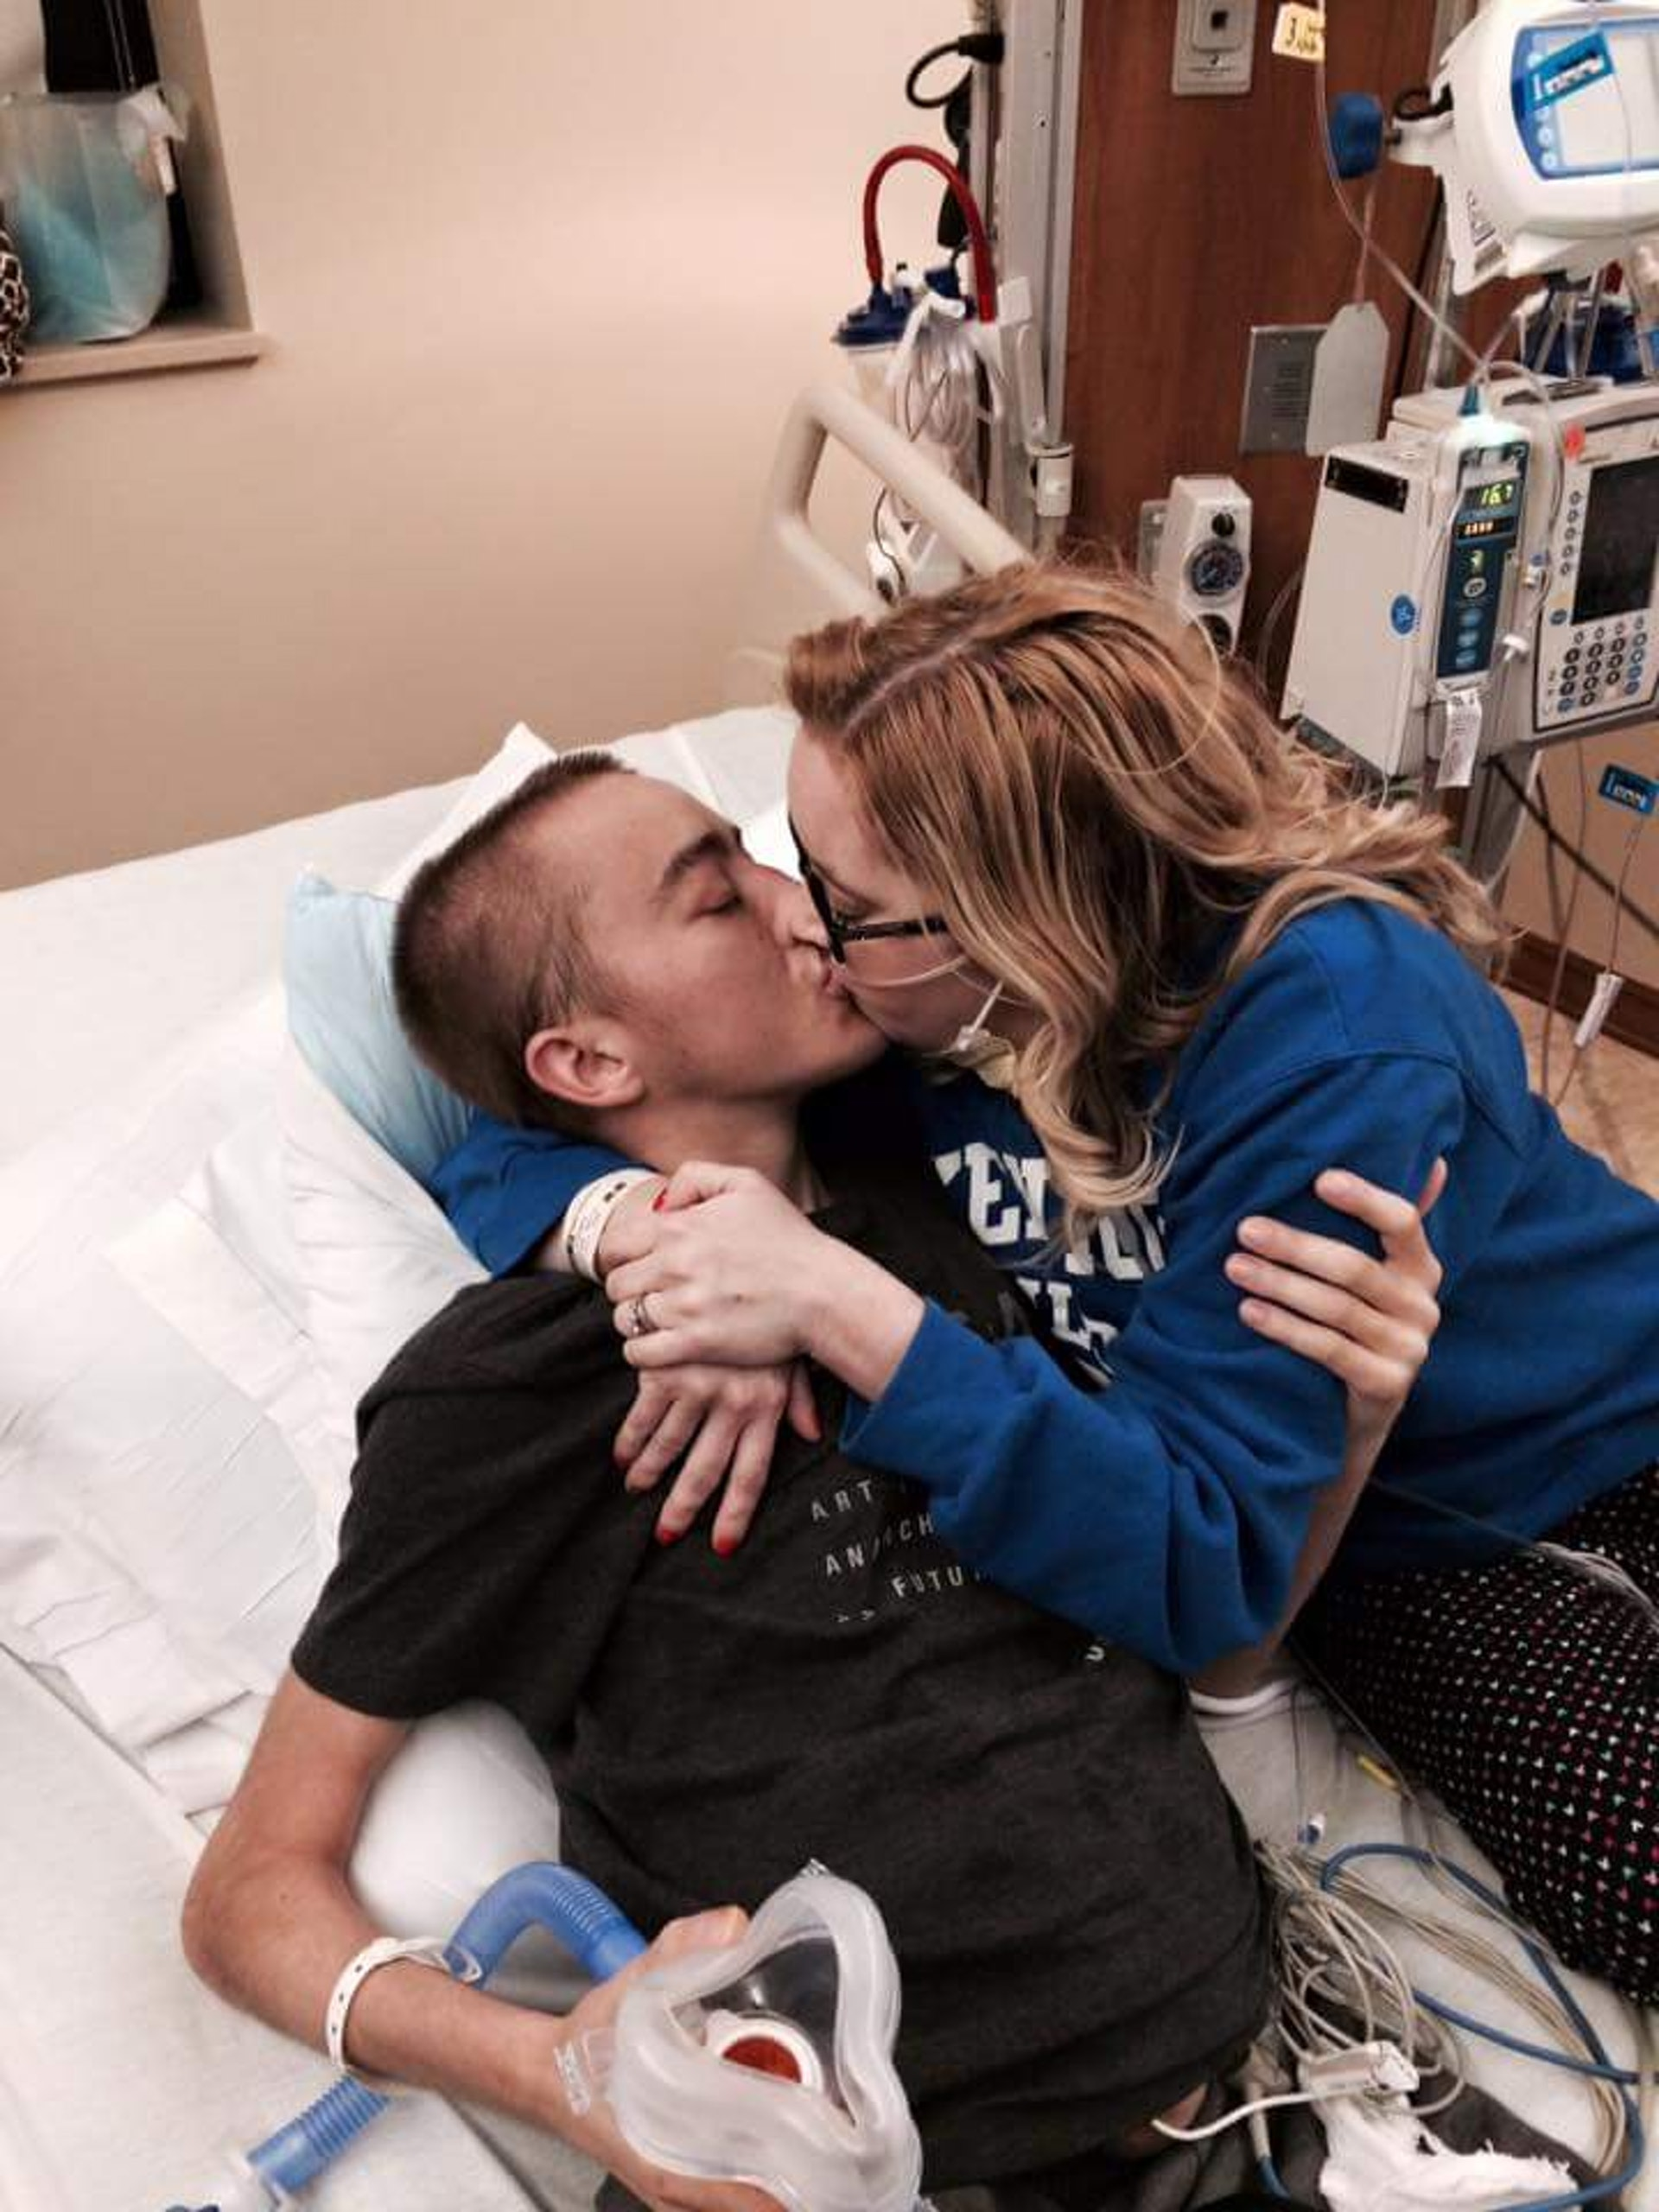 凱蒂(Katie Prager)和道爾頓(Dalton Prager)雖然被迫分開兩地治療,但相隔遠方仍不時為對方打氣。(facebook「Dalton and Katie Prager's Transplant Page」圖片)